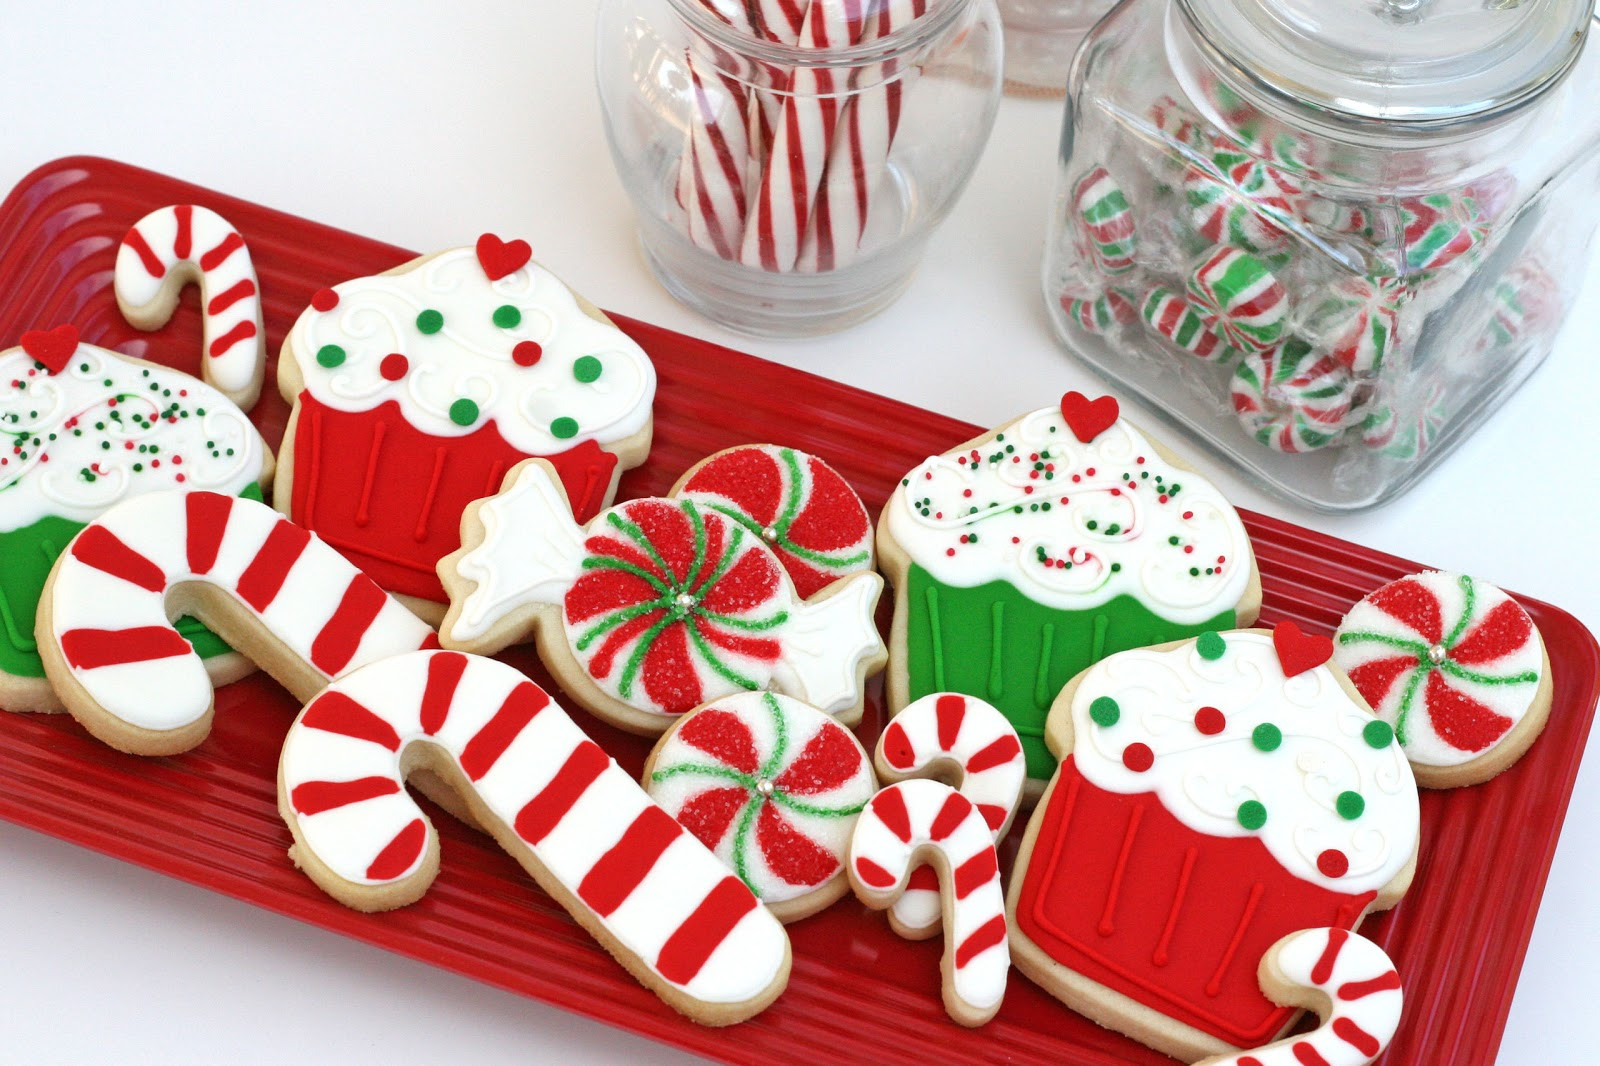 Decorated Christmas Sugar Cookies  Christmas Cookies Galore Glorious Treats